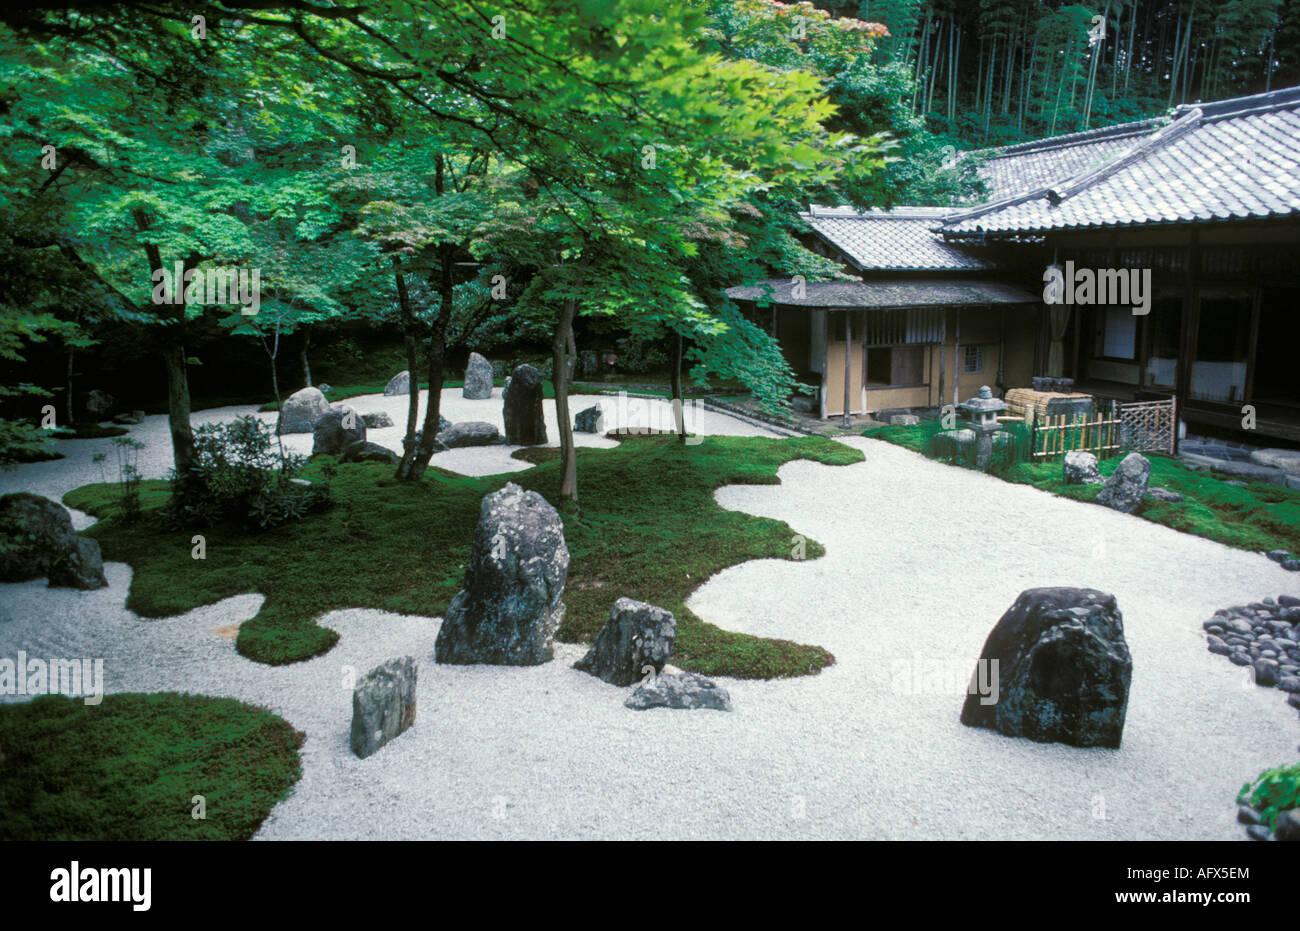 Japan Hiroshima House with Japanese Zen garden Stock Photo